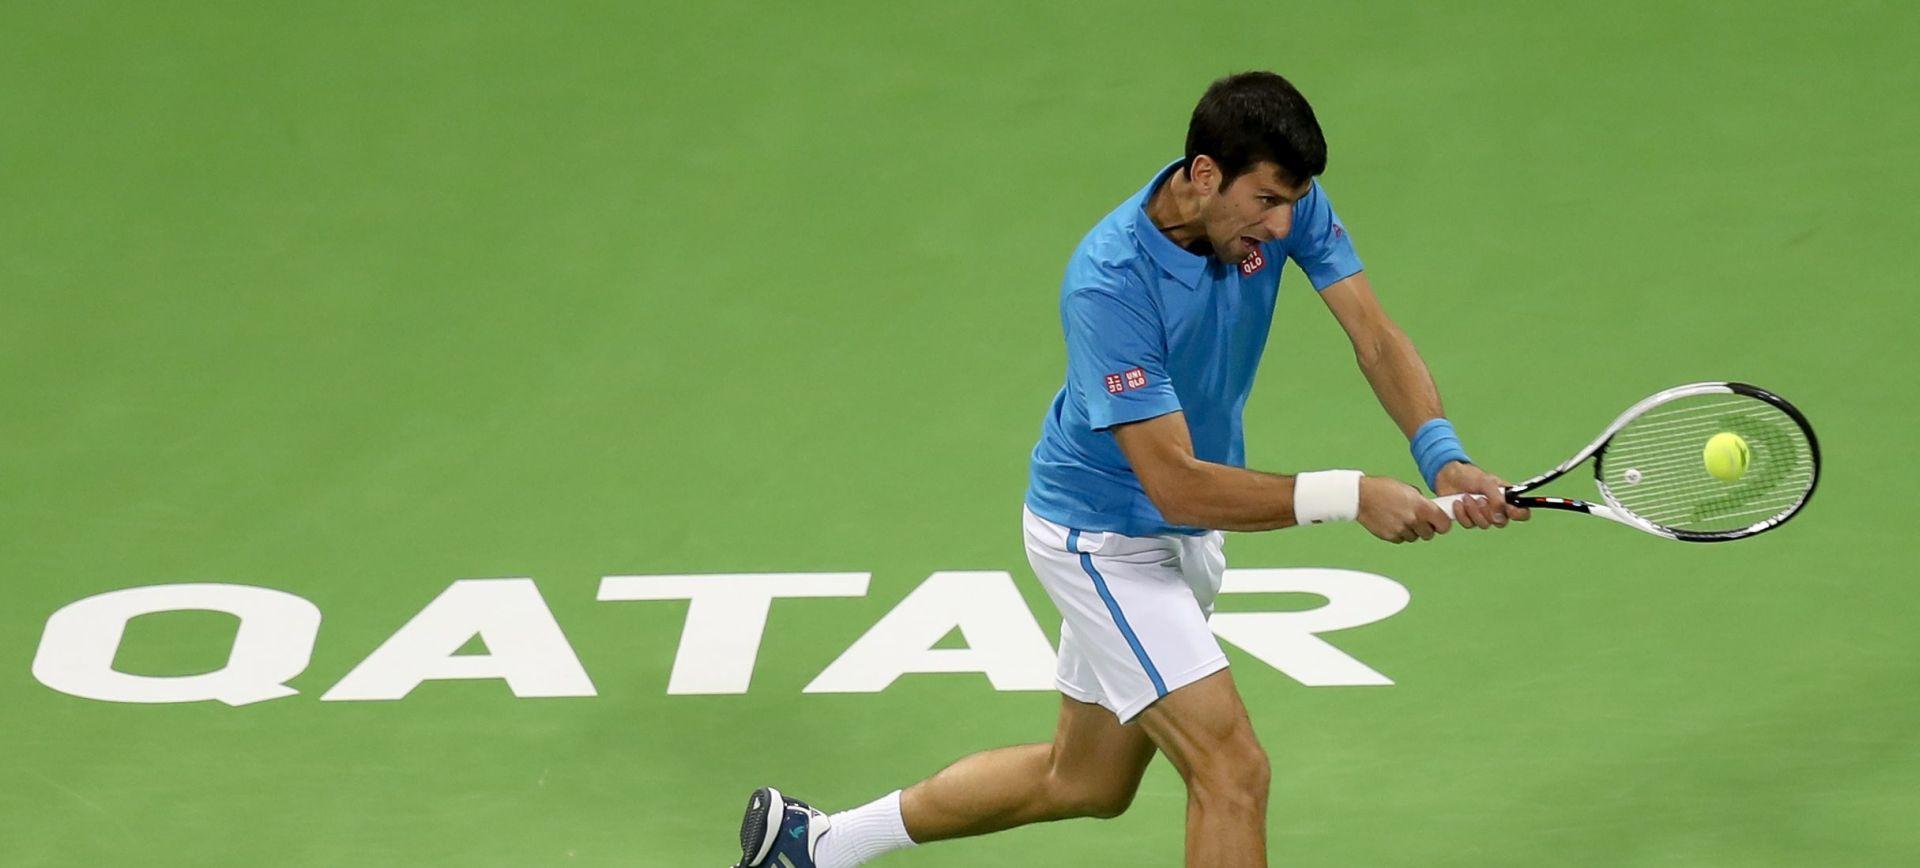 VIDEO: ATP DOHA Đoković zaustavio Murrayev niz